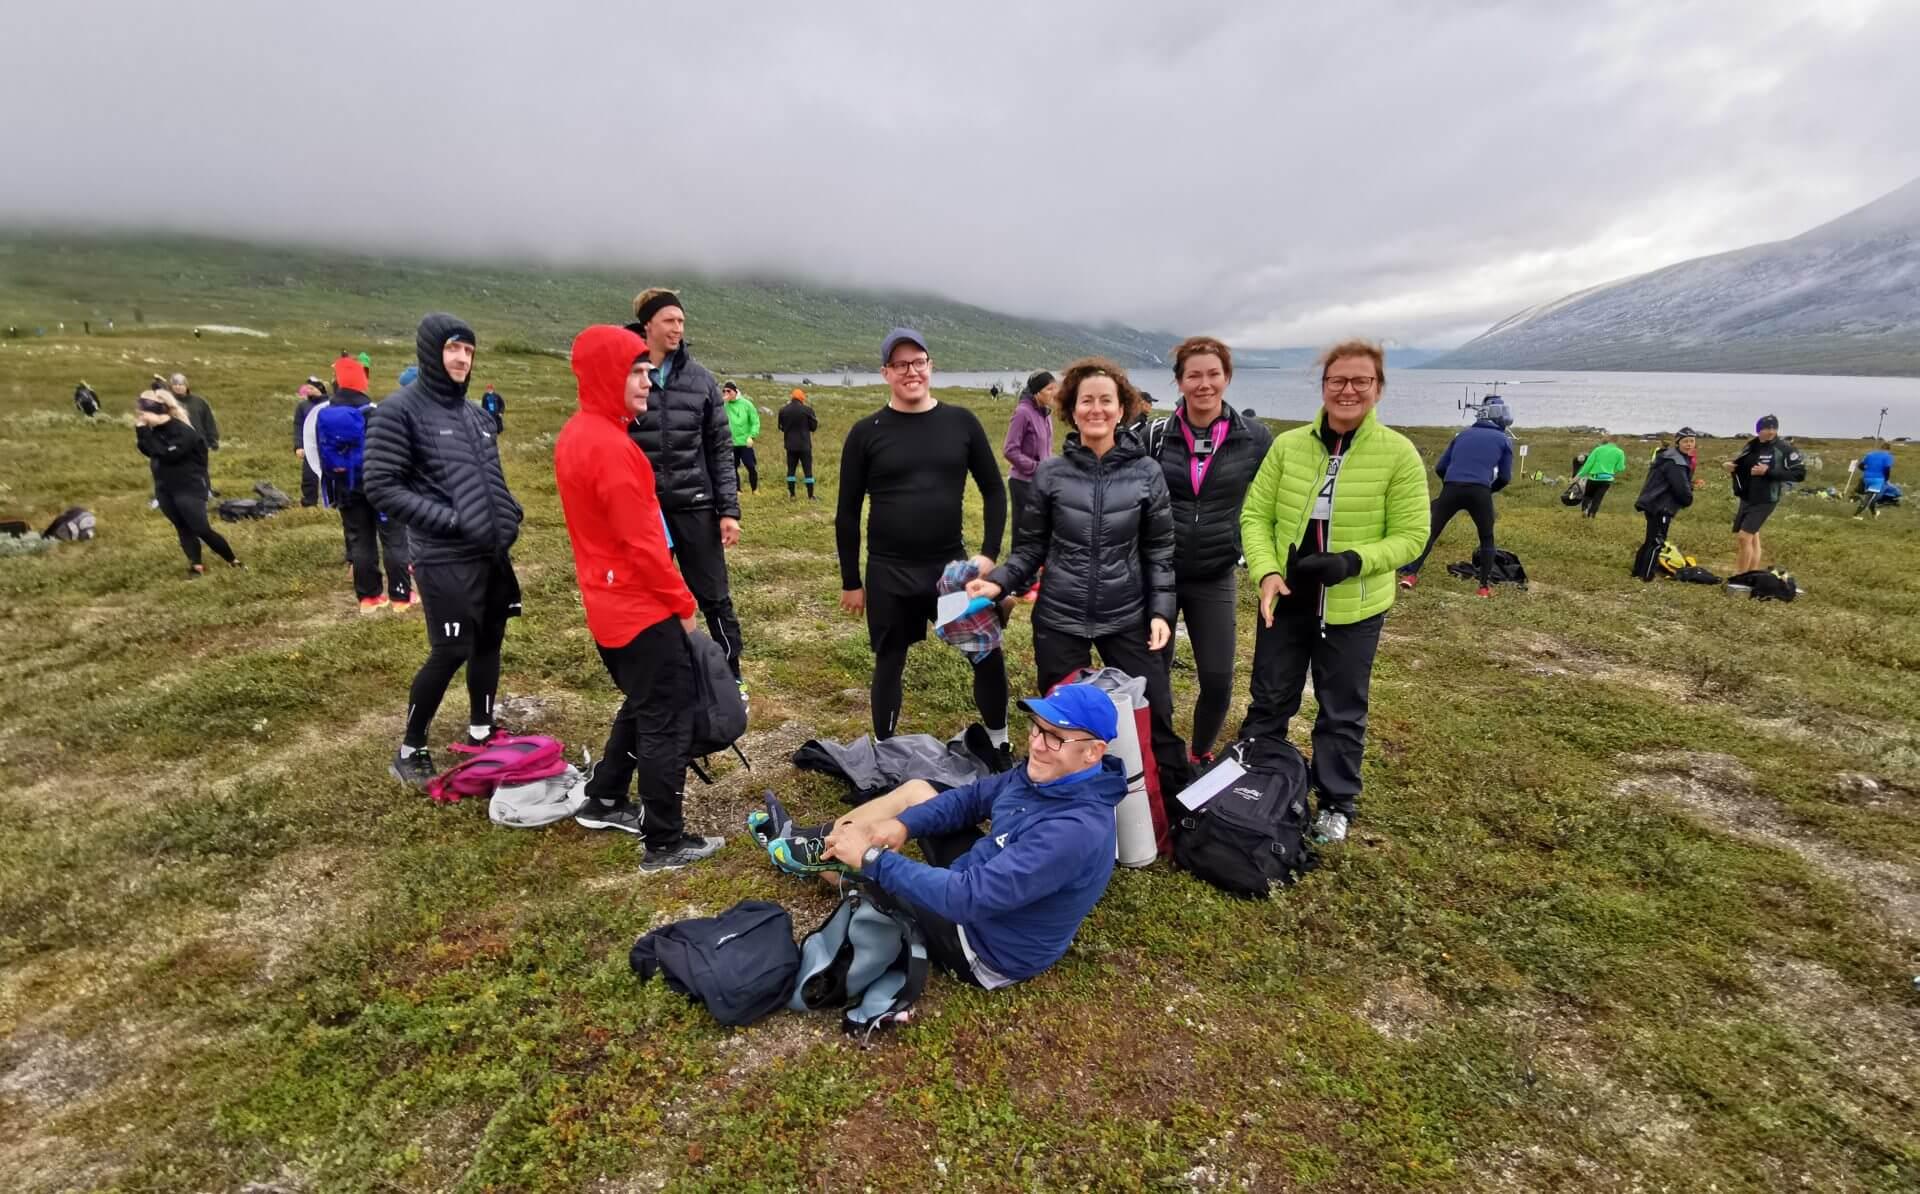 Arctic Circle Race 2019 Polcirkelloppet Guijaure start Piteå